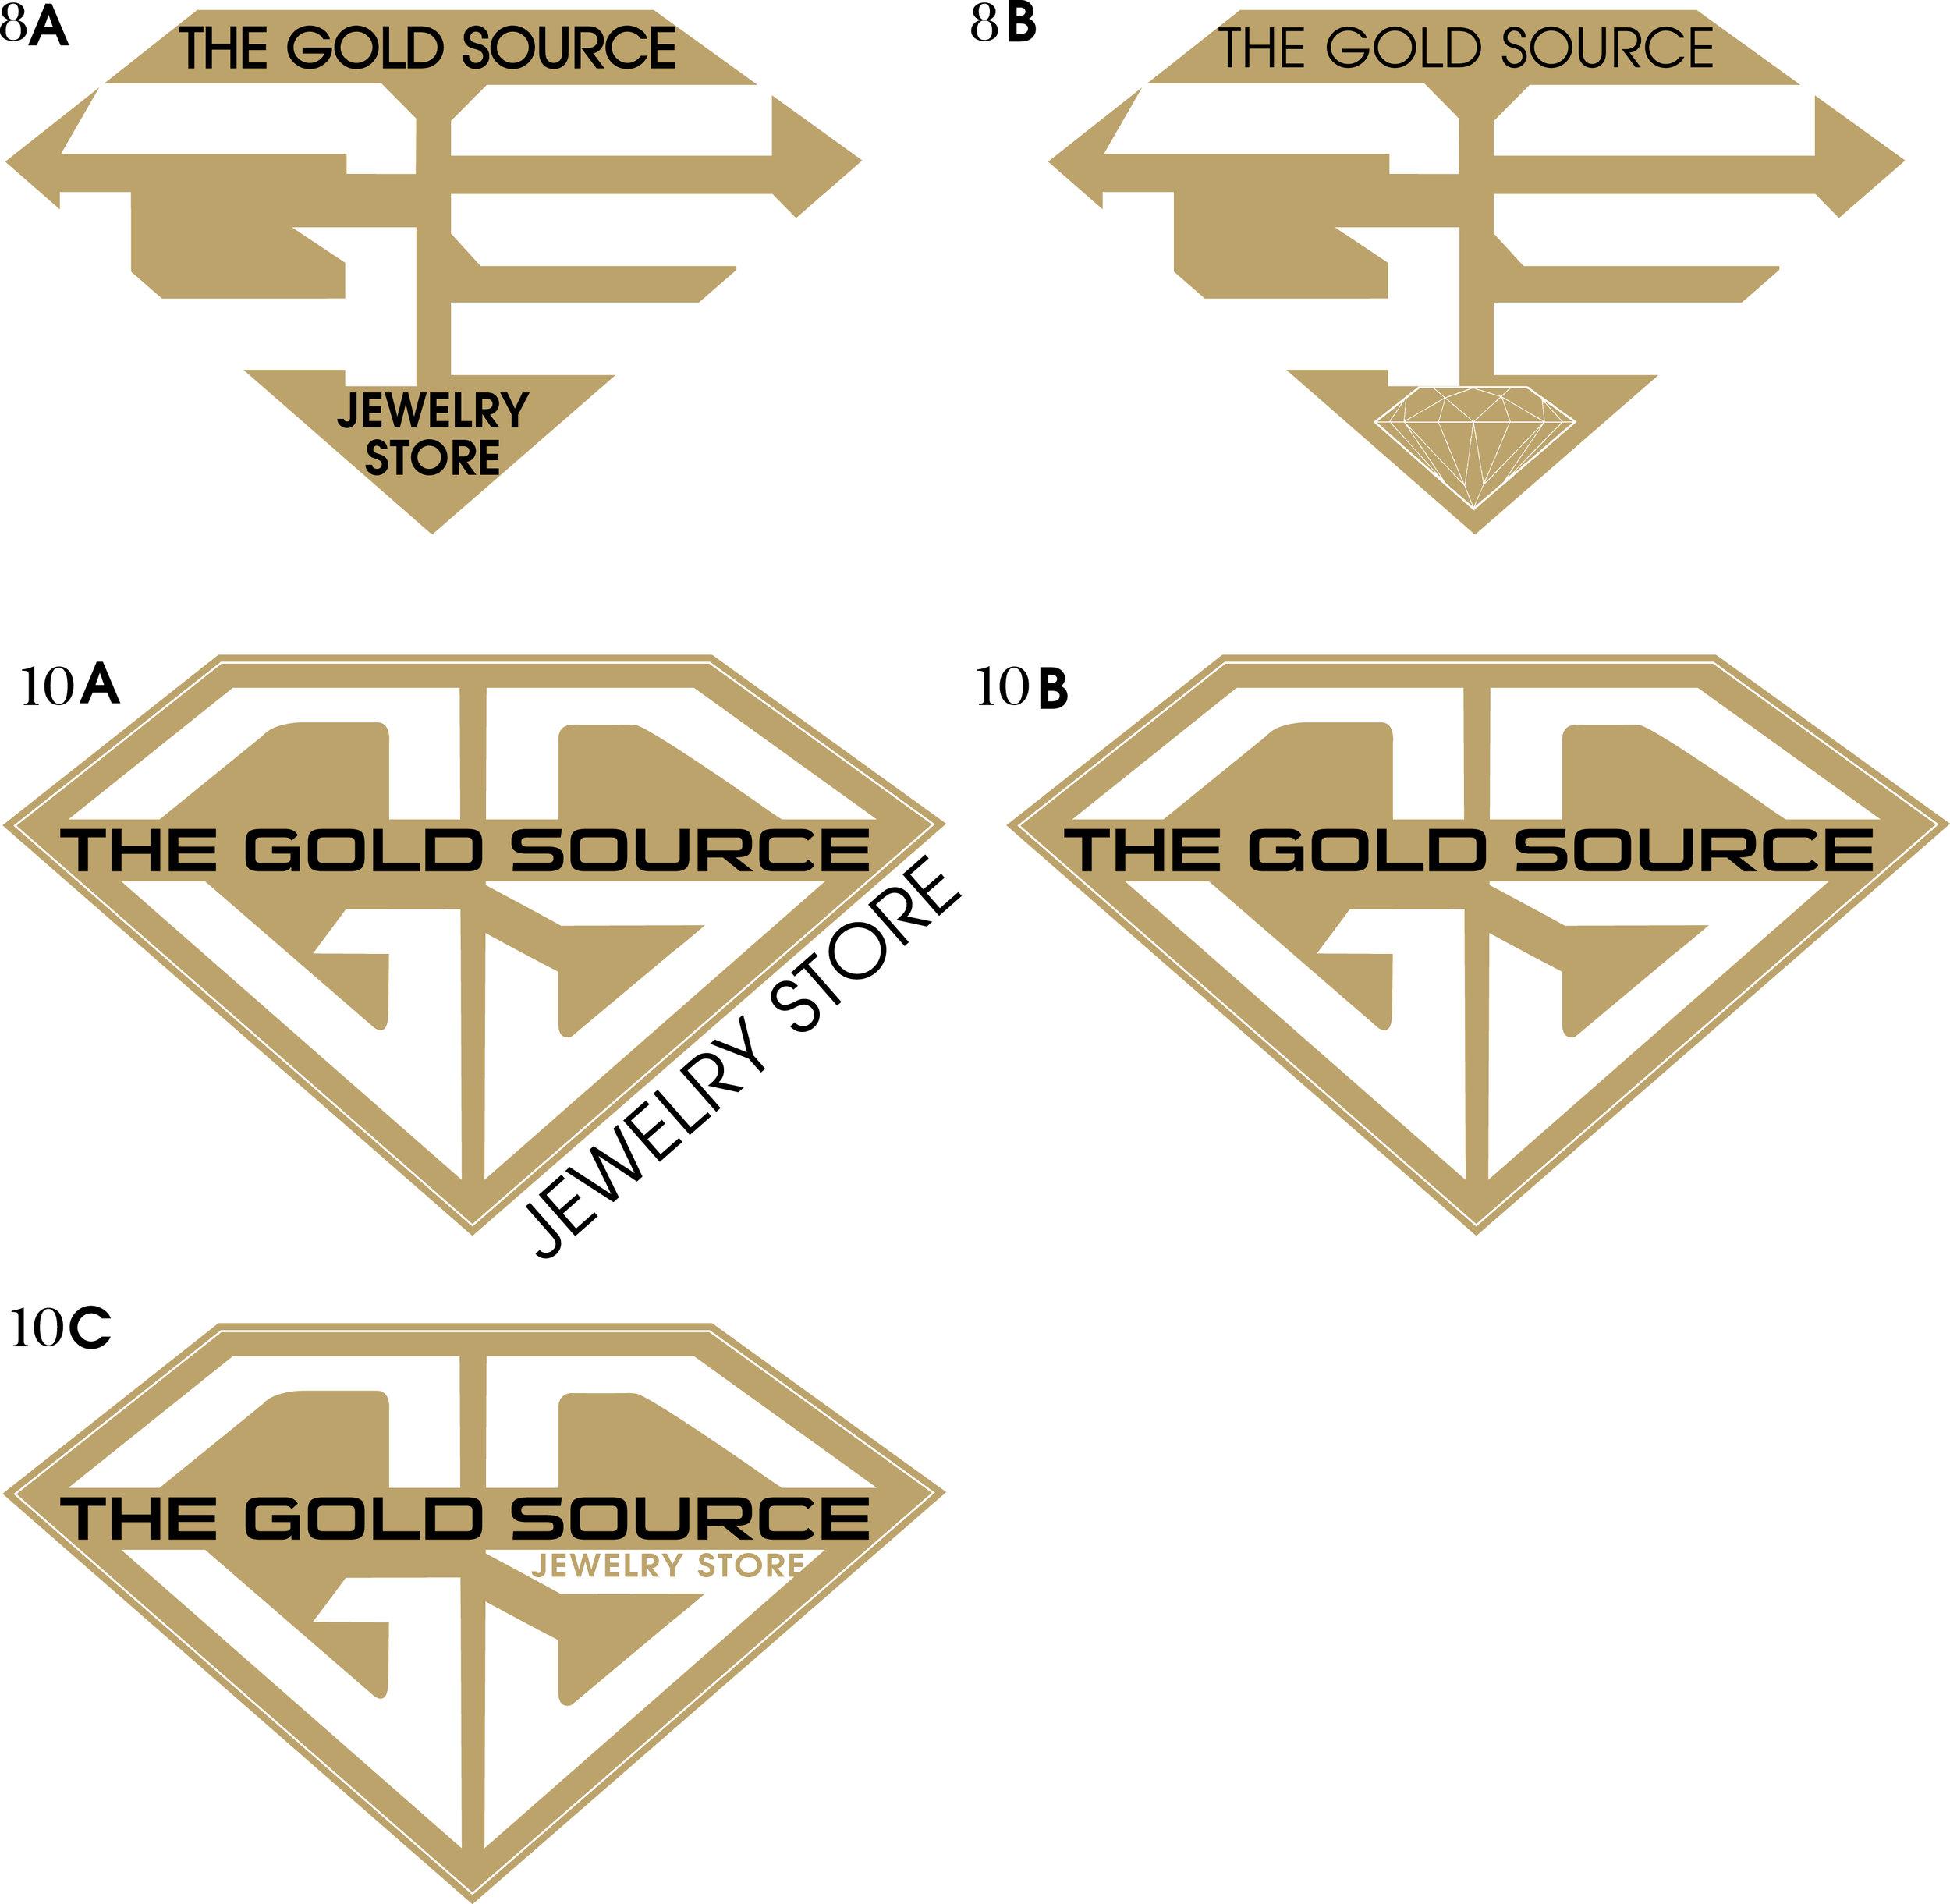 TheGoldSourceLogo-concept2.jpg